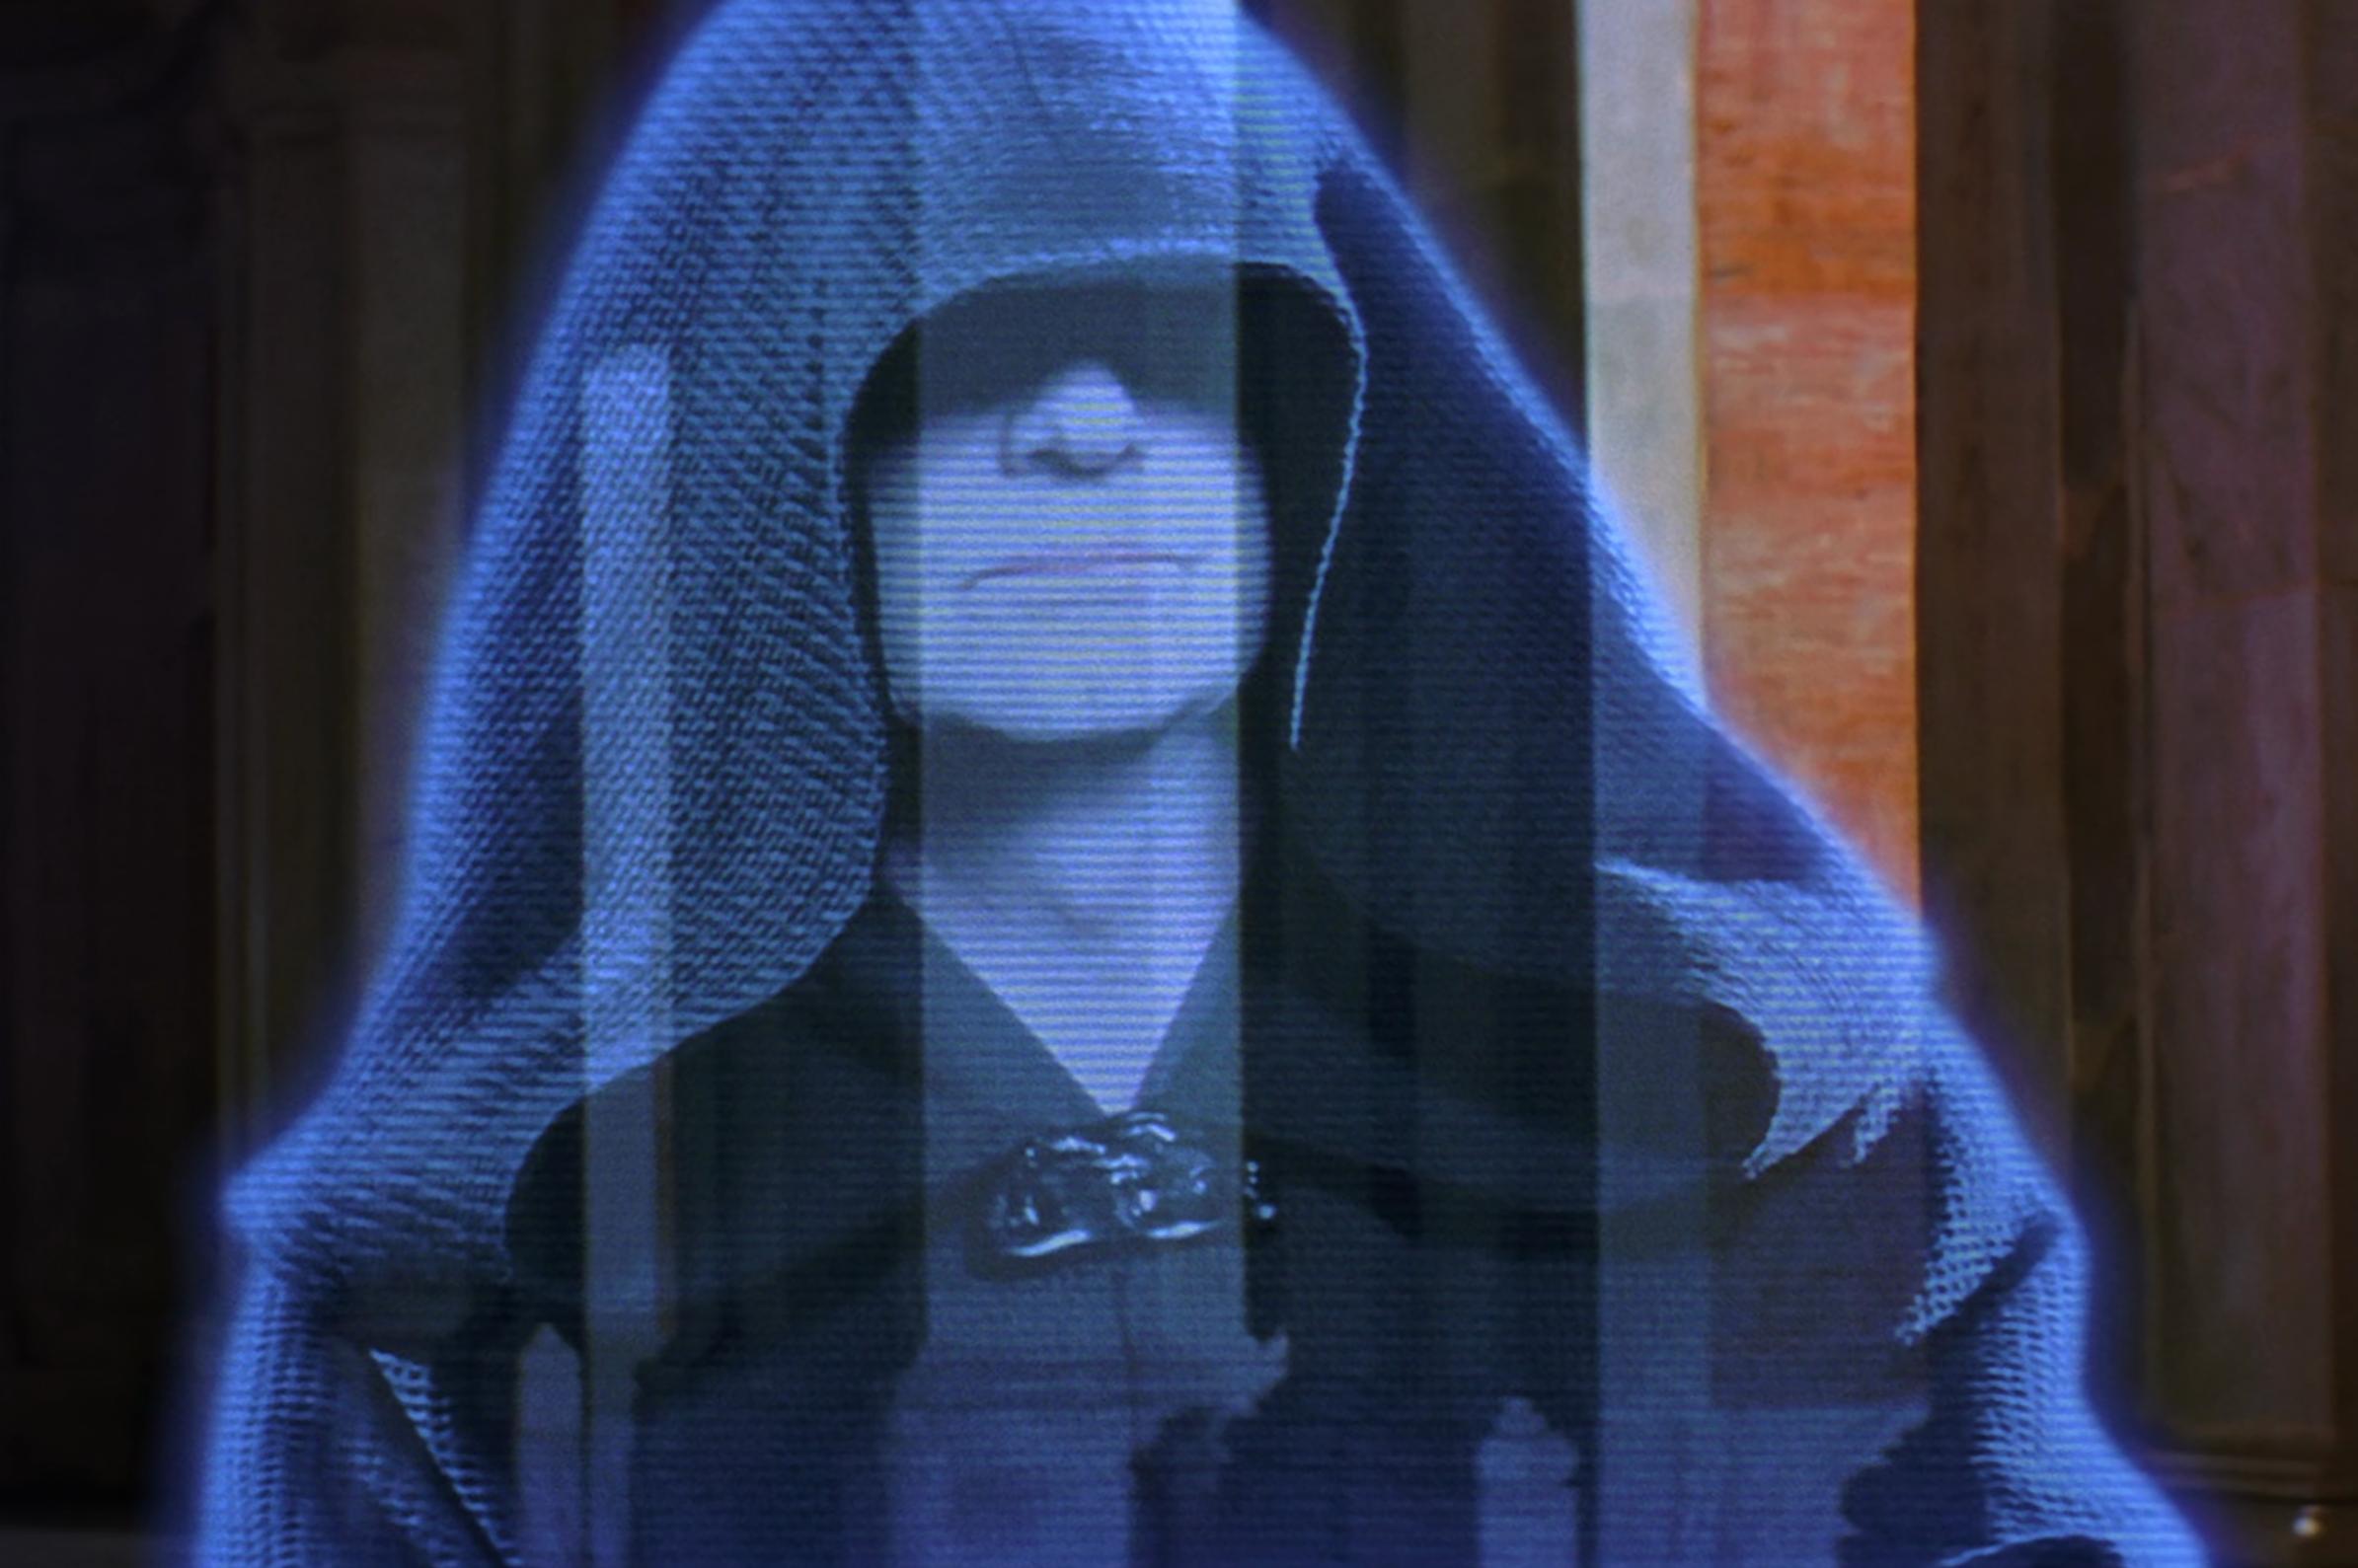 Sidious hologram